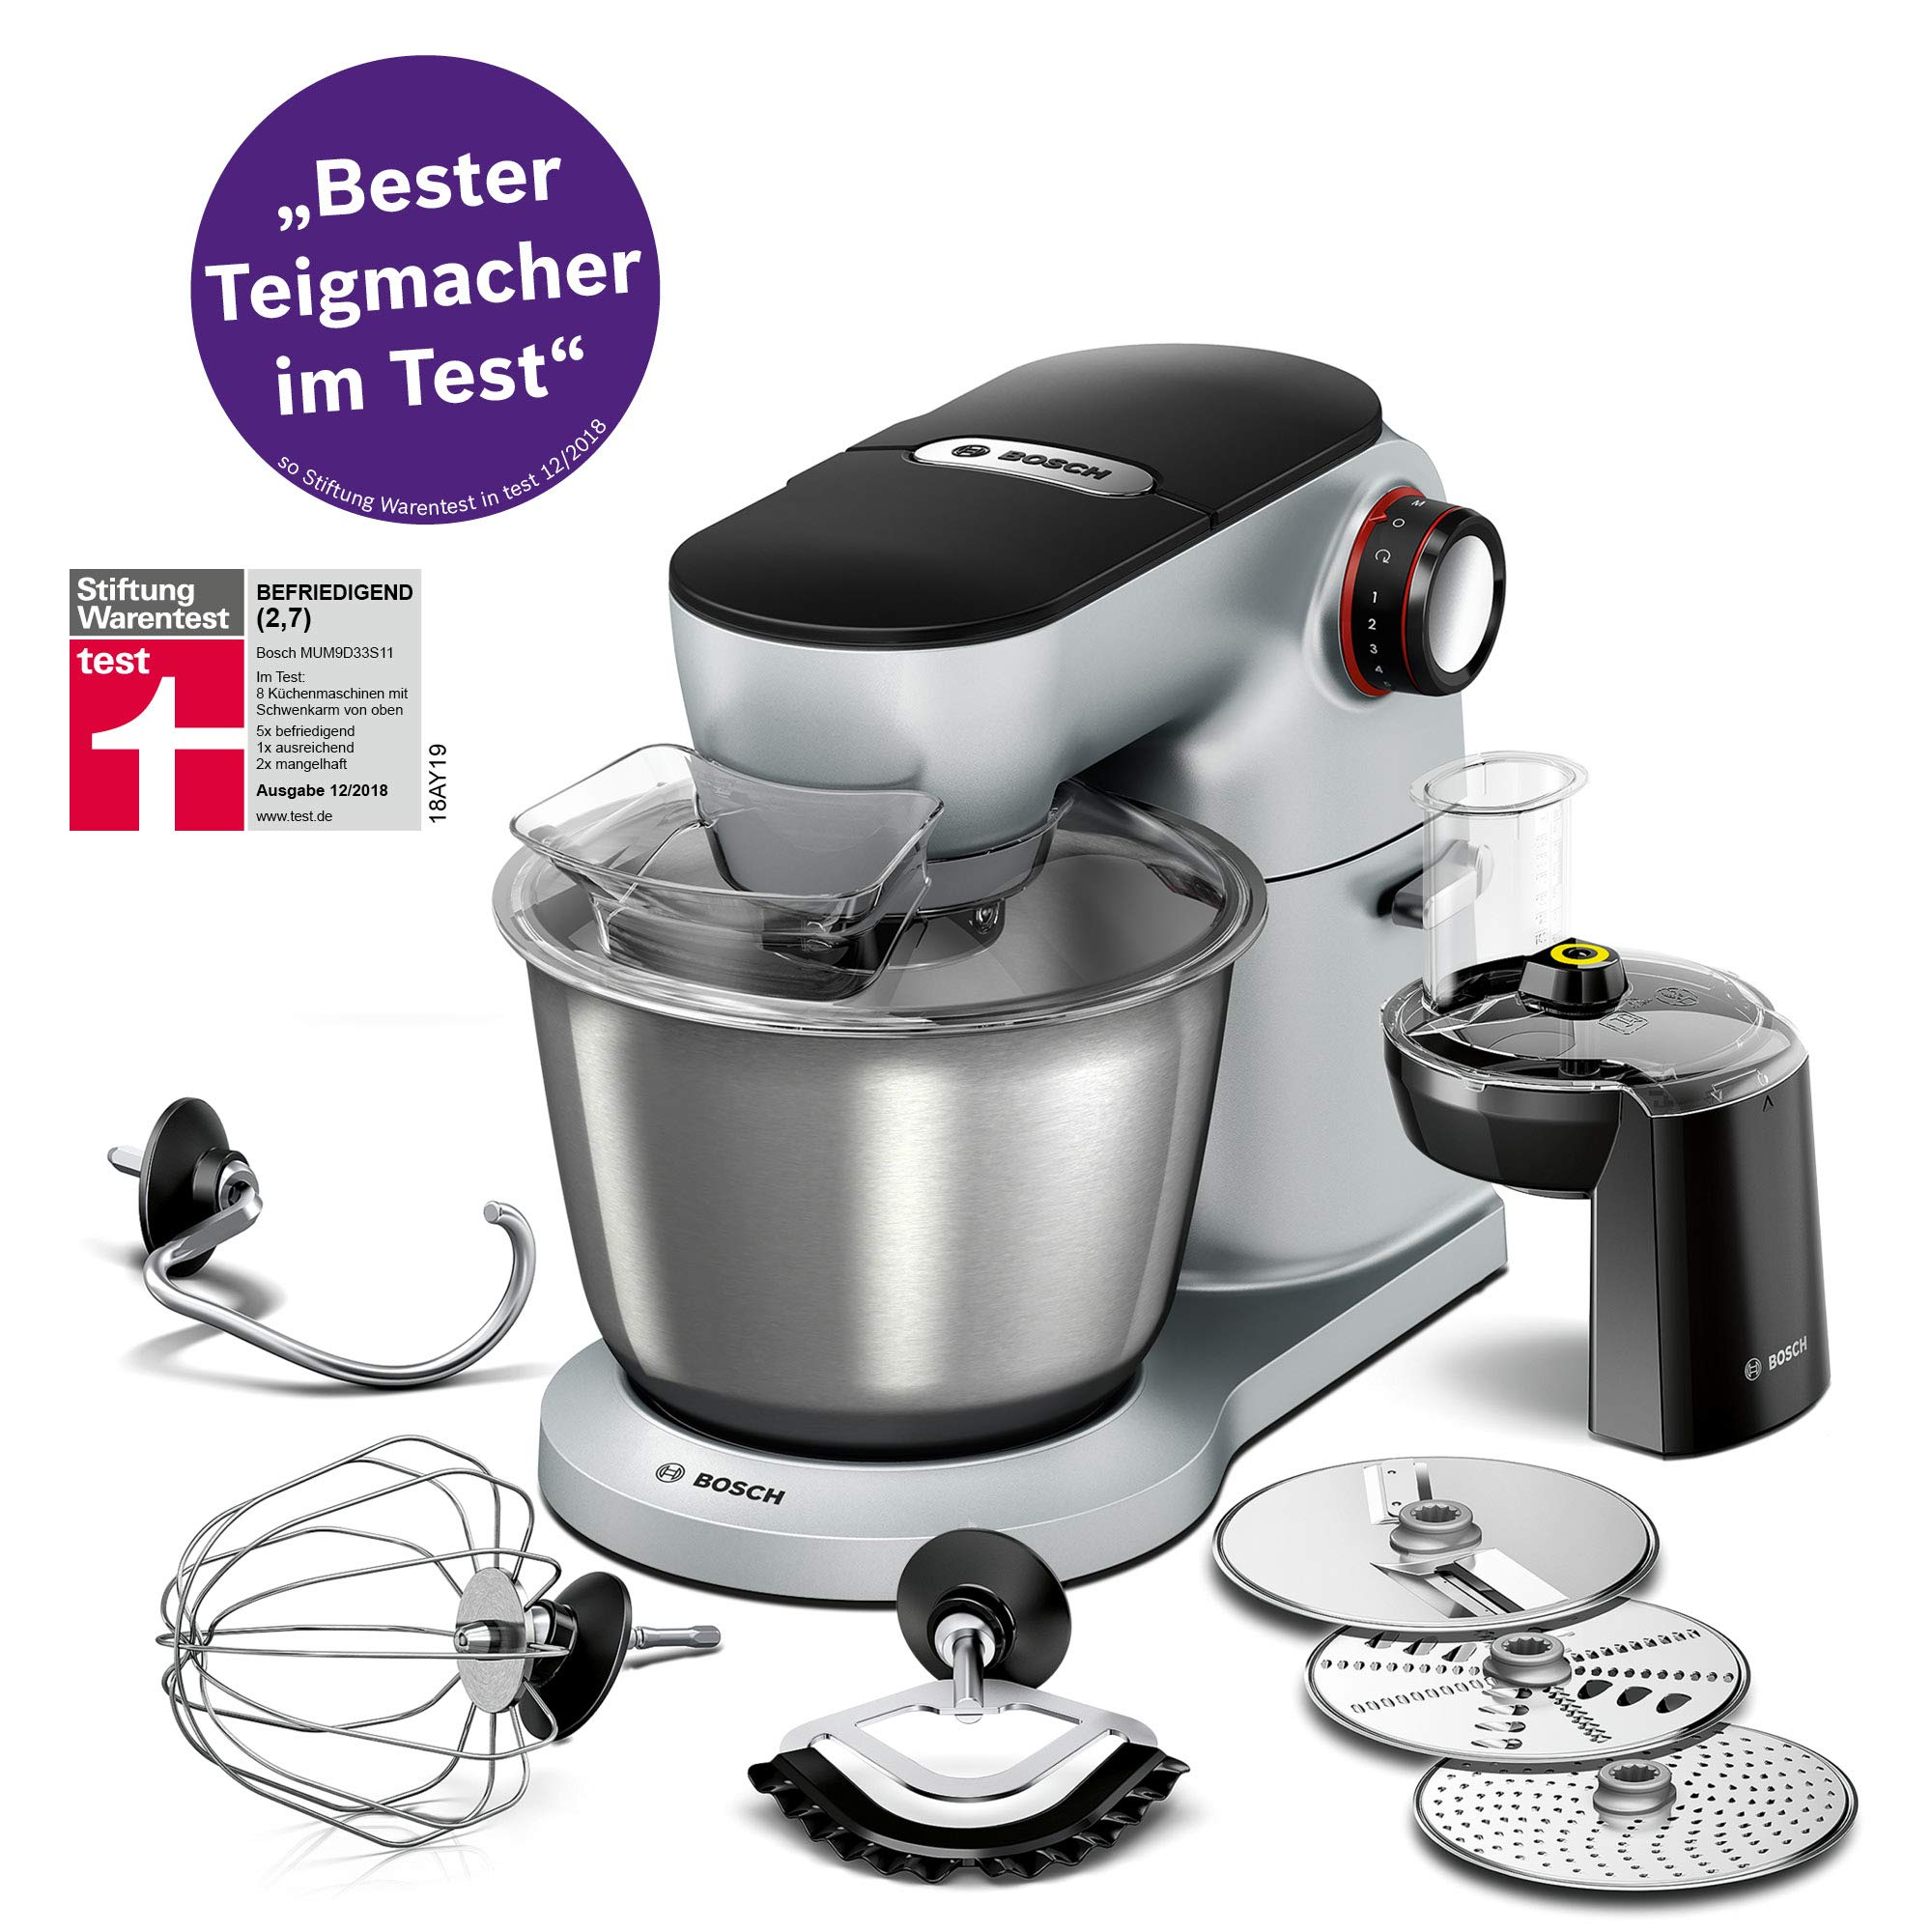 Bosch MUM9D33S11 - Robot de cocina (5,5 L, Acero inoxidable, Giratorio, 220-240 V, 50-60 Hz, Acero inoxidable): Amazon.es: Hogar